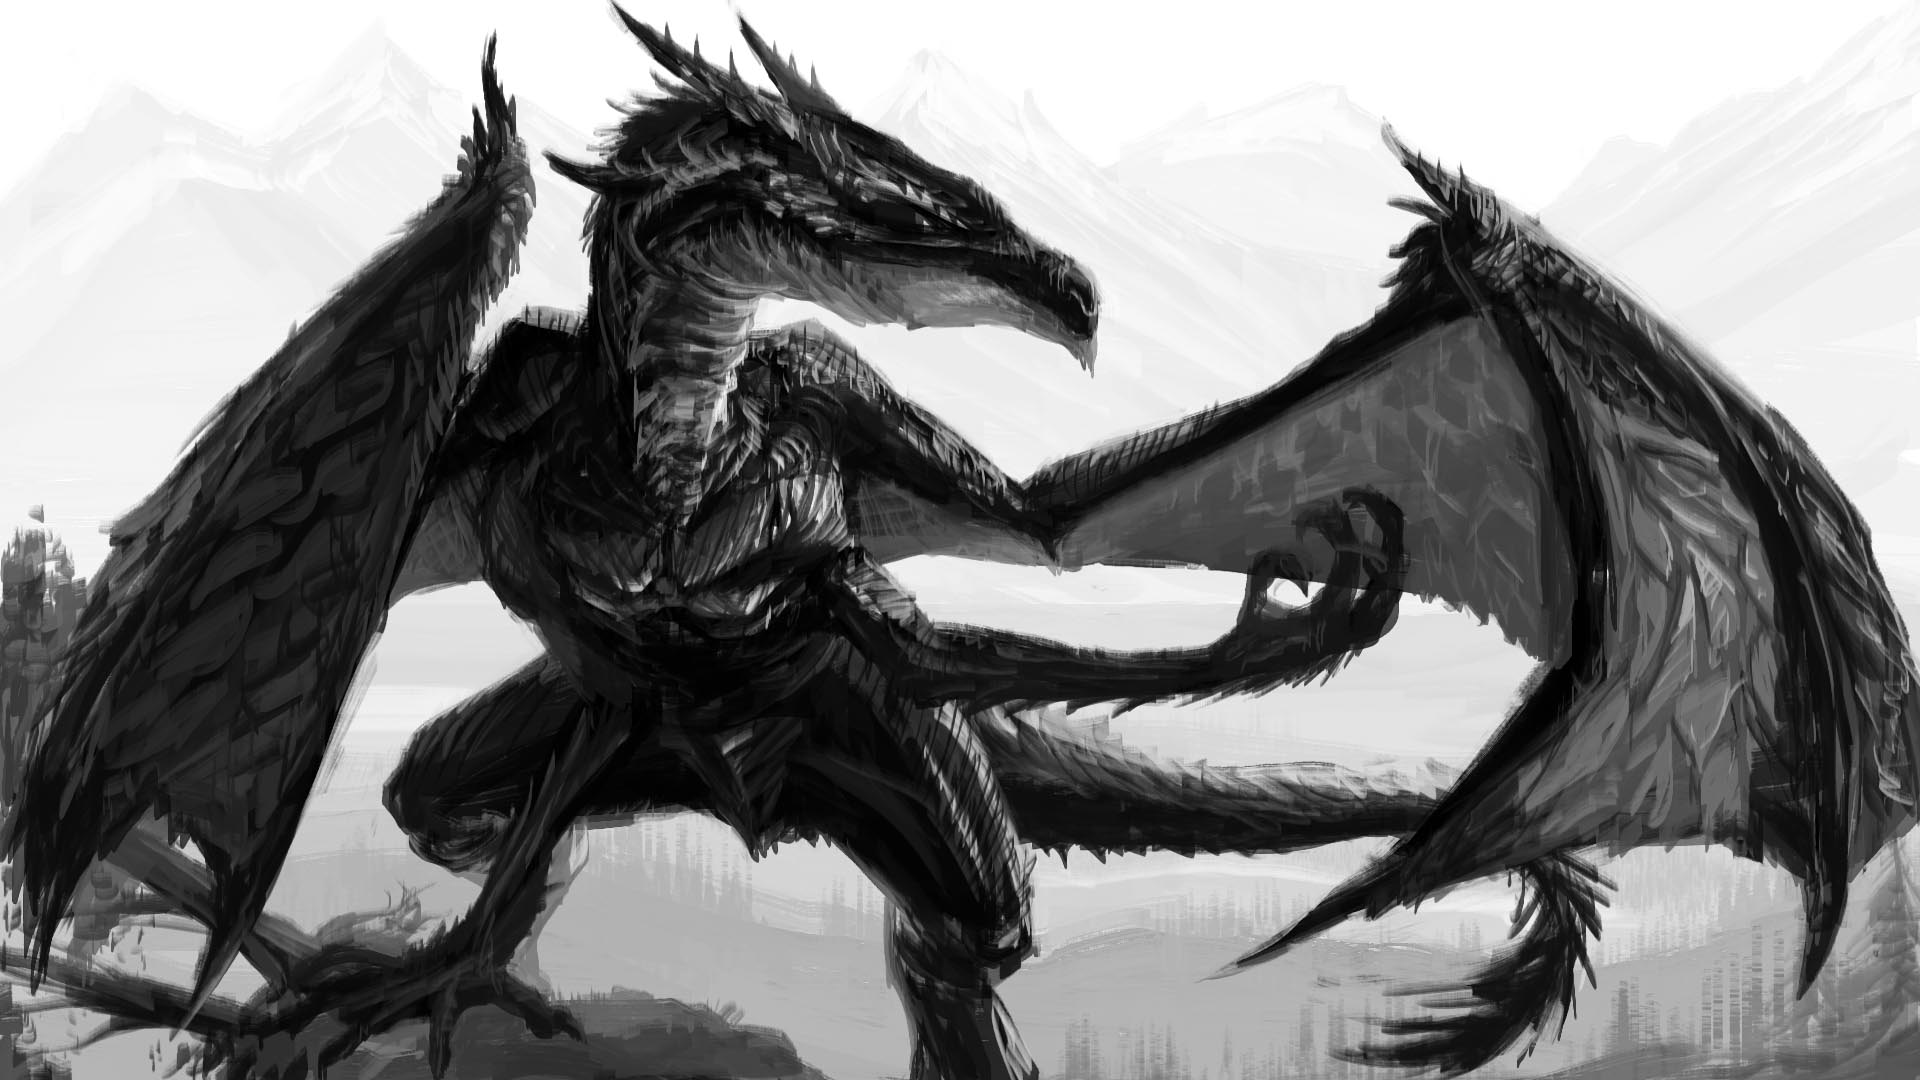 Ortosis Dragon Dragon Lines by 1Rich1